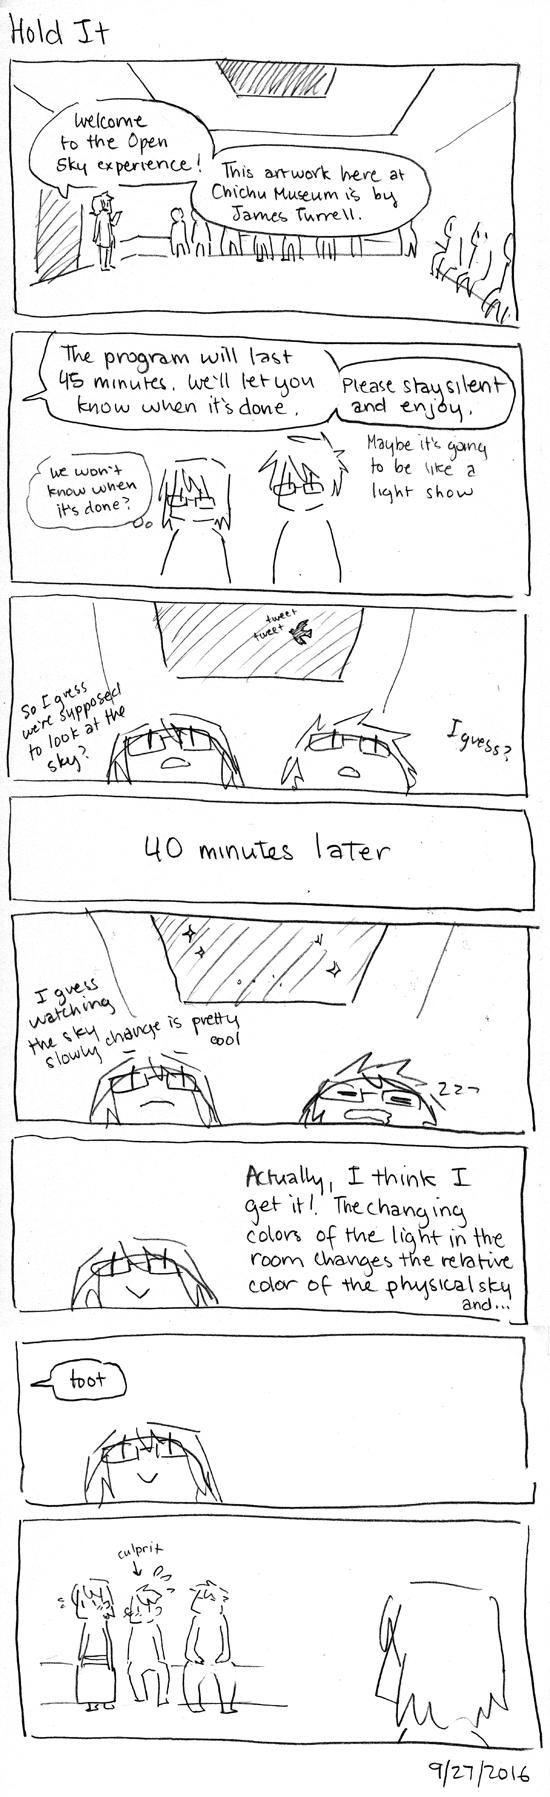 Japan Comics: Hold It